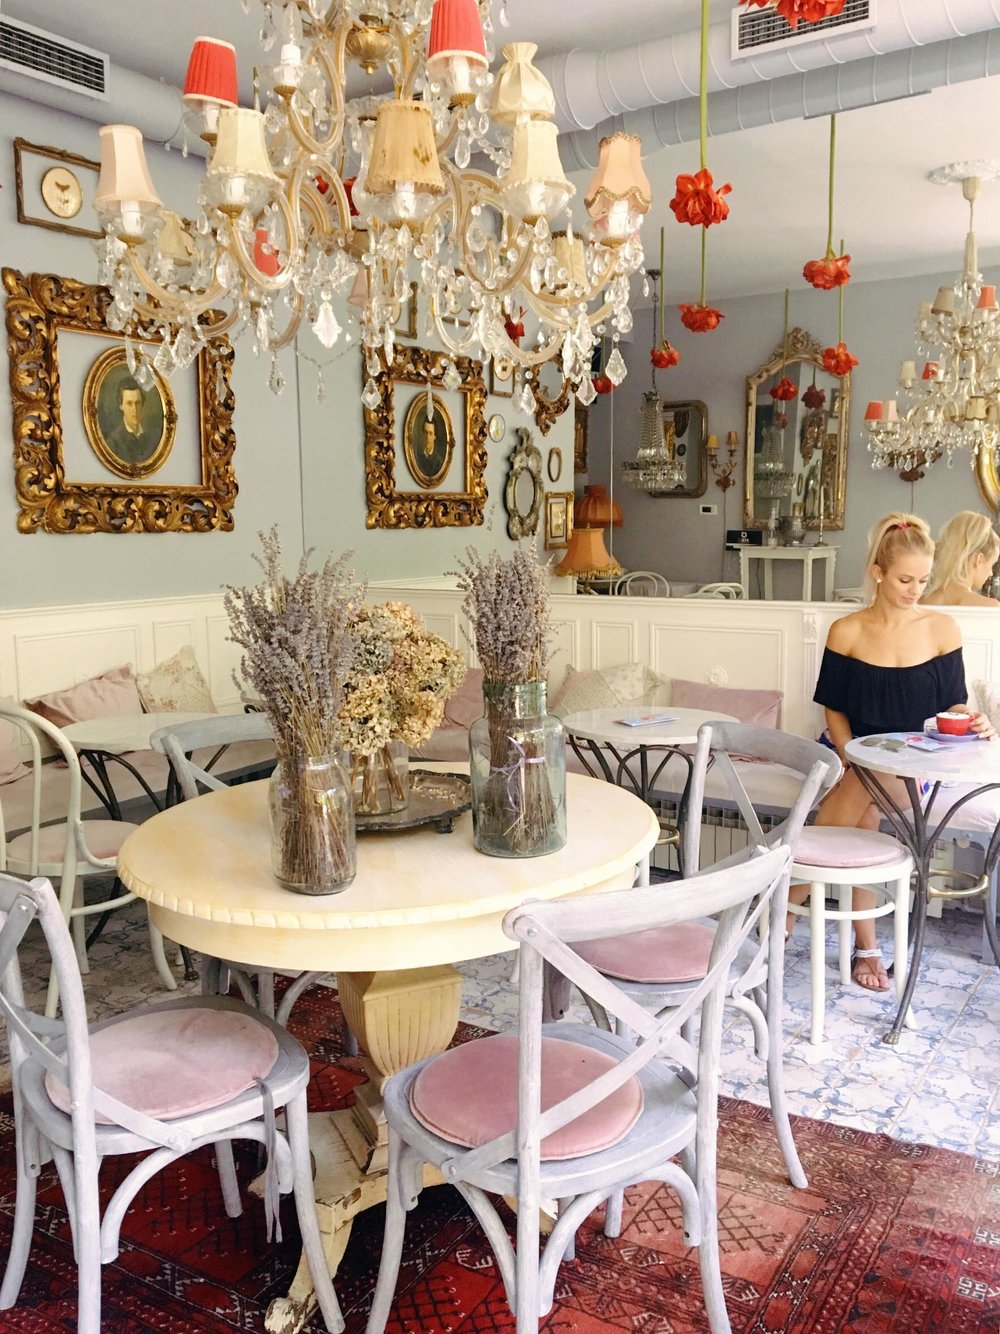 Caffe Bar Finjak | Second Room | jumpseatjenny | Zagreb Croatia.jpg